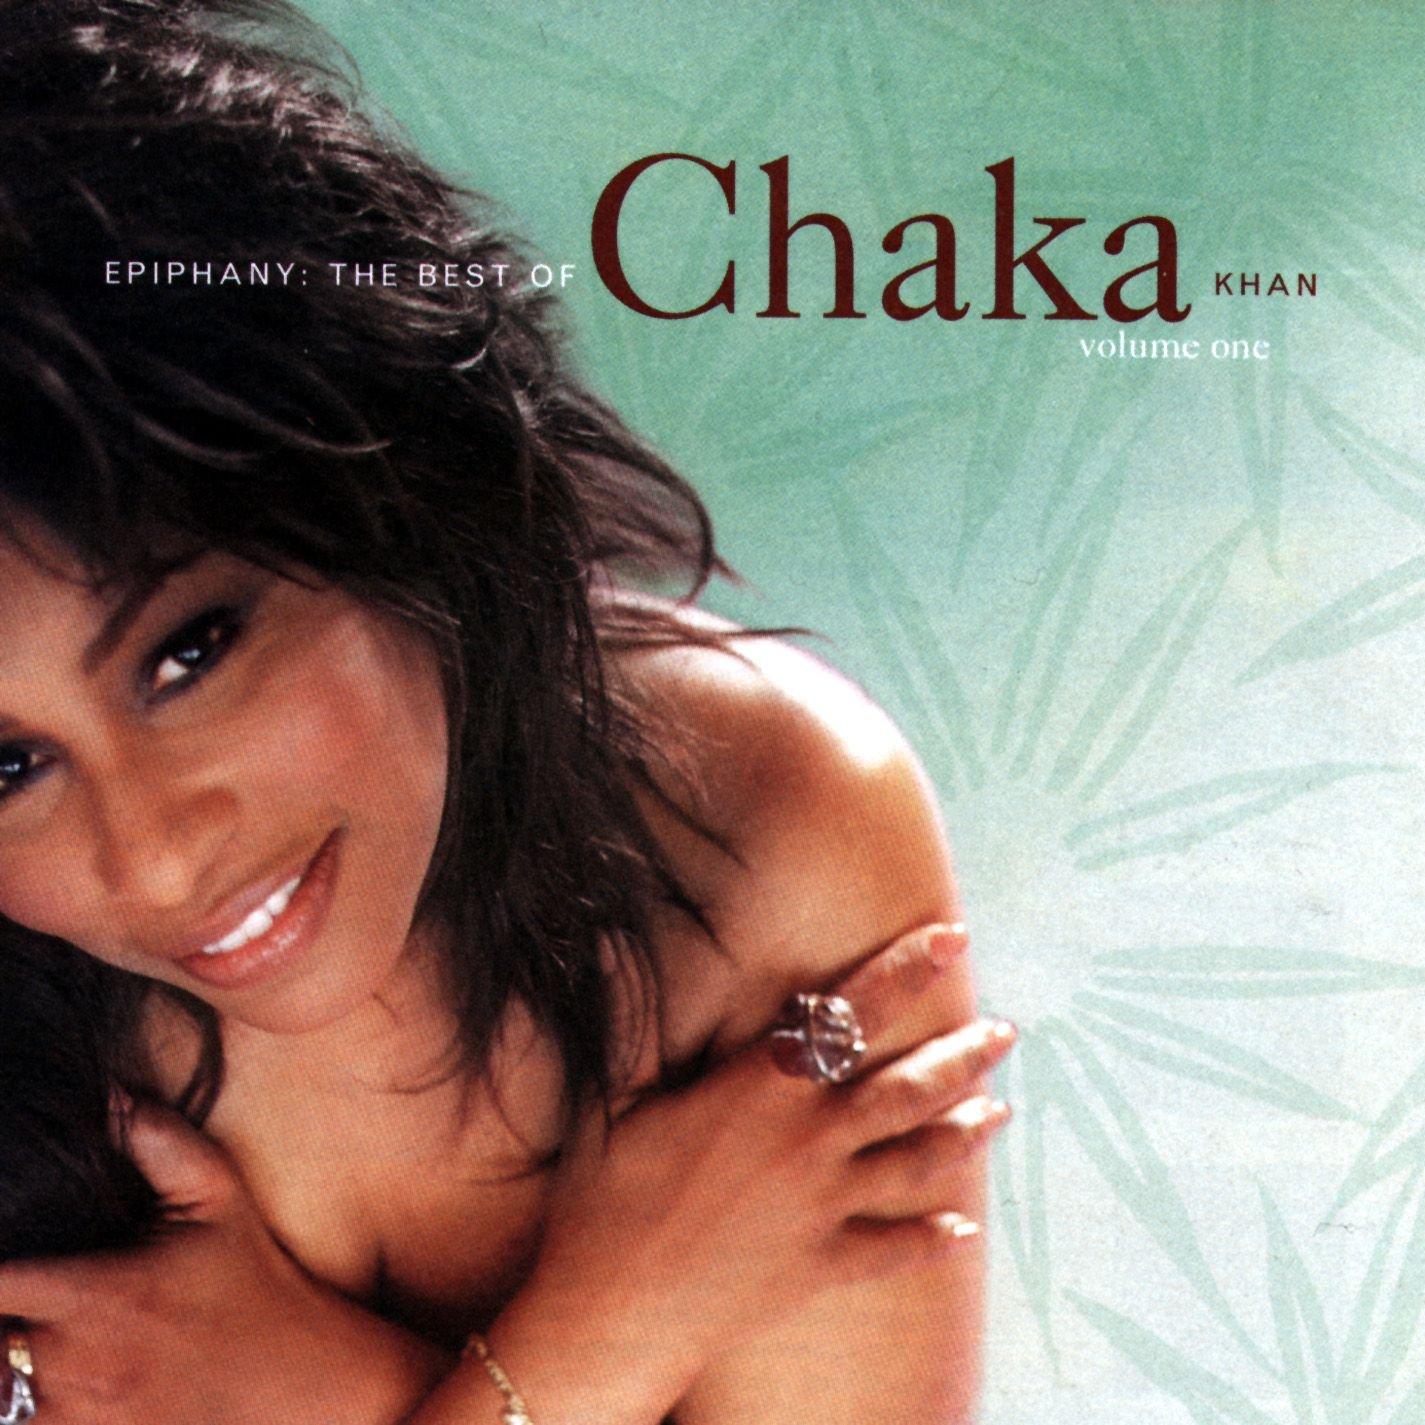 Epiphany: Best of Chaka Khan - Volume 1